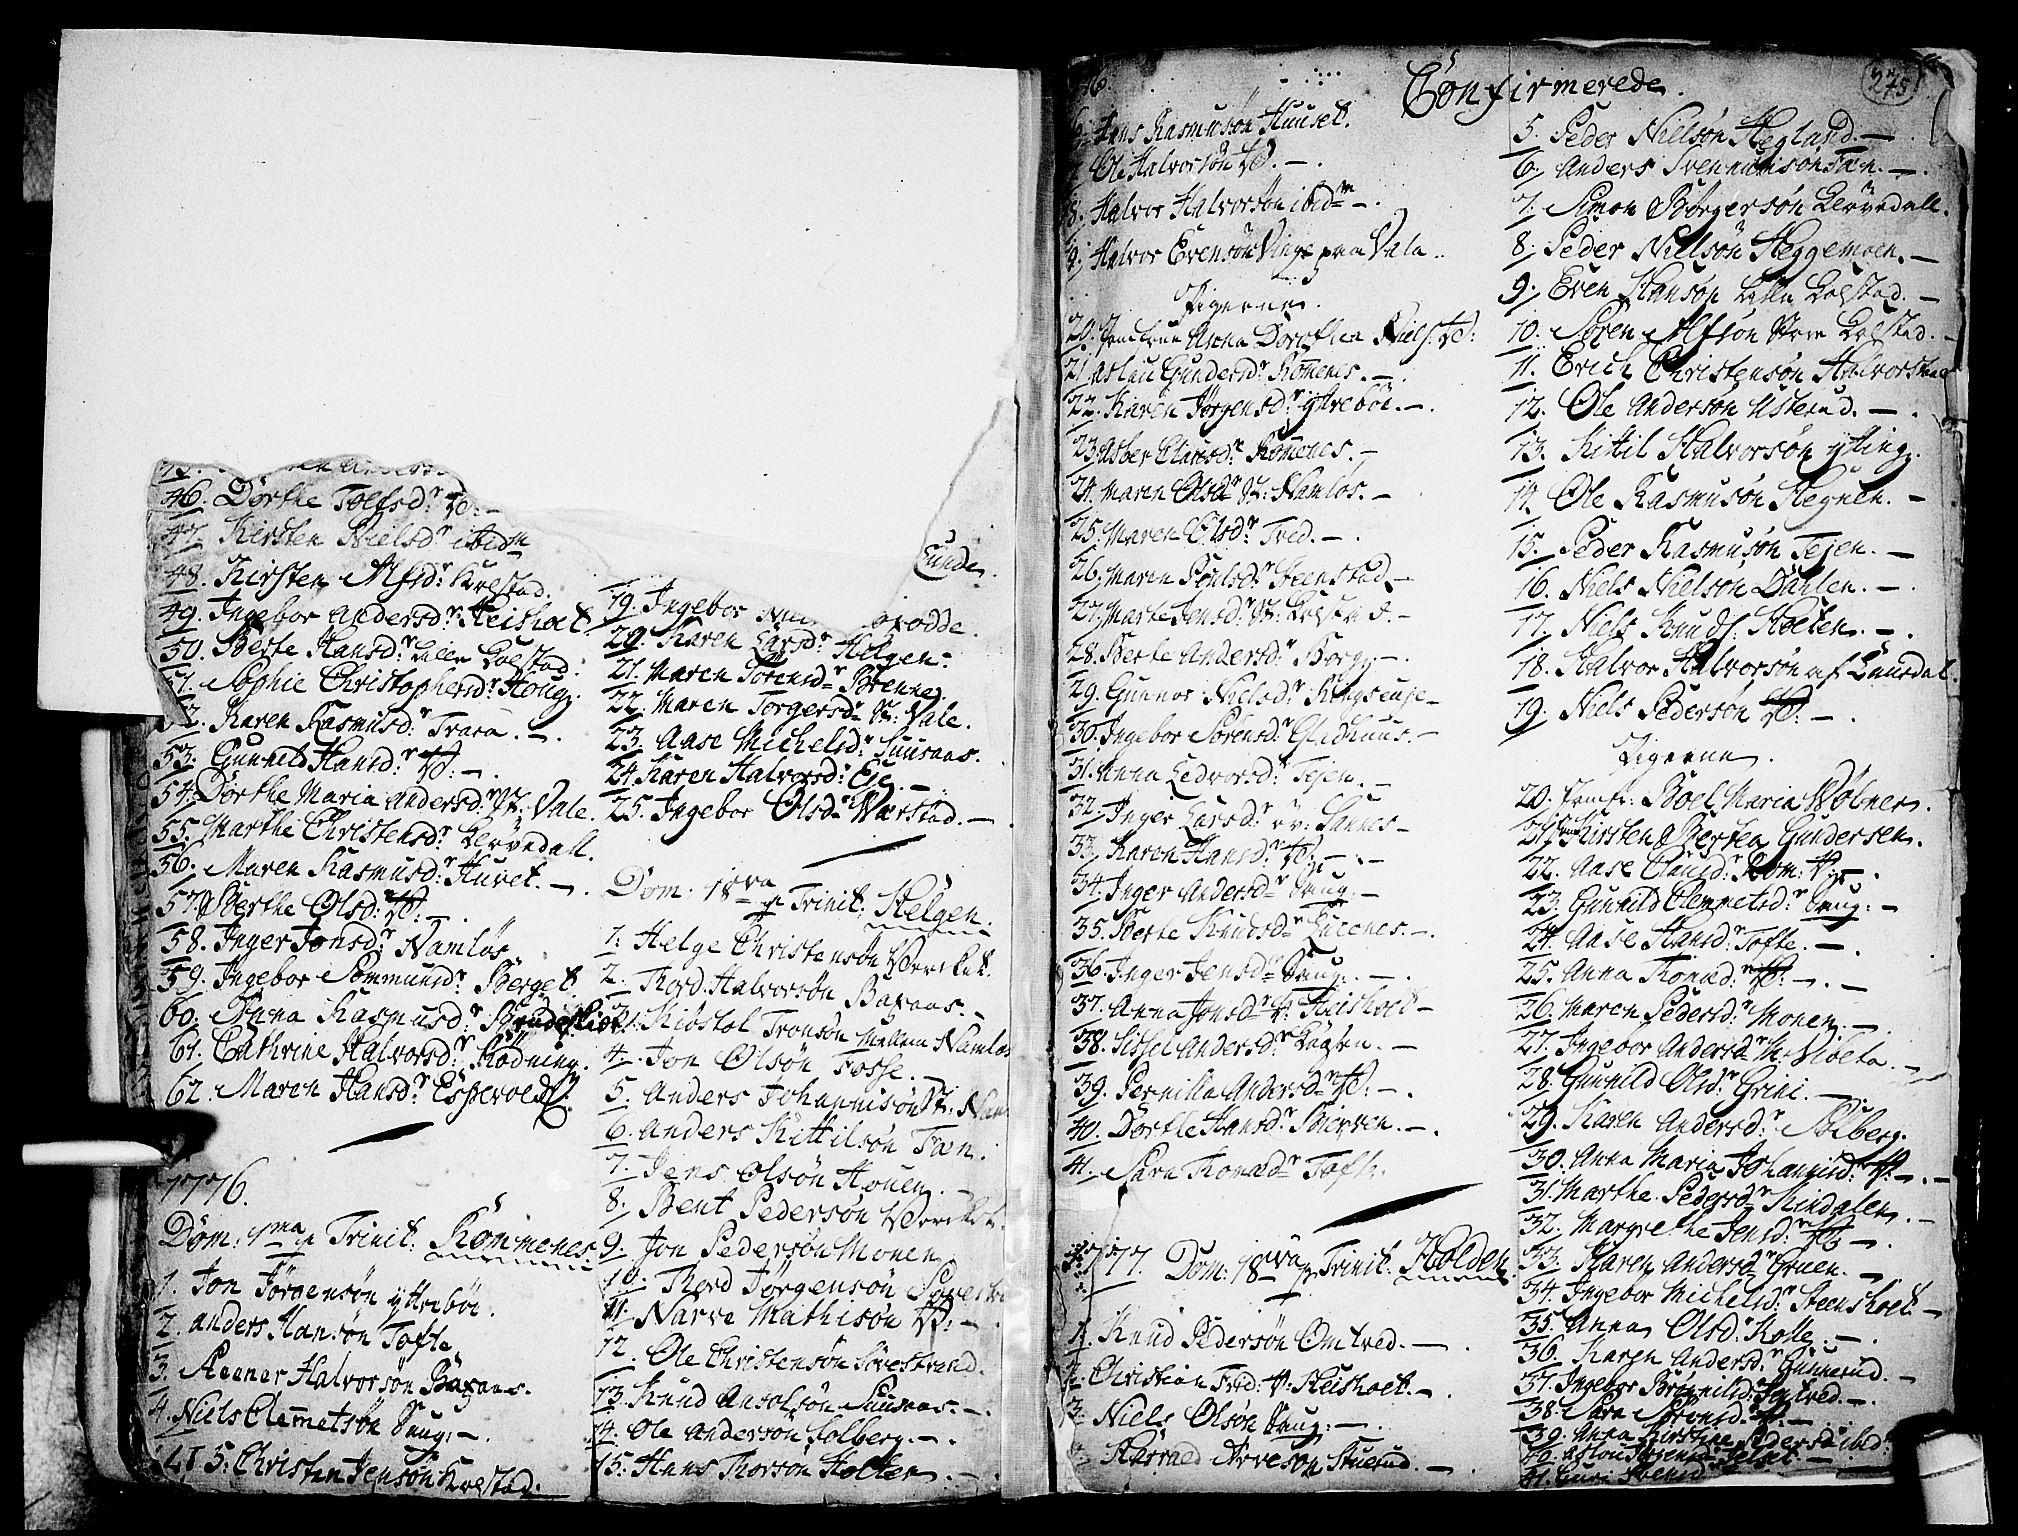 SAKO, Holla kirkebøker, F/Fa/L0001: Ministerialbok nr. 1, 1717-1779, s. 275